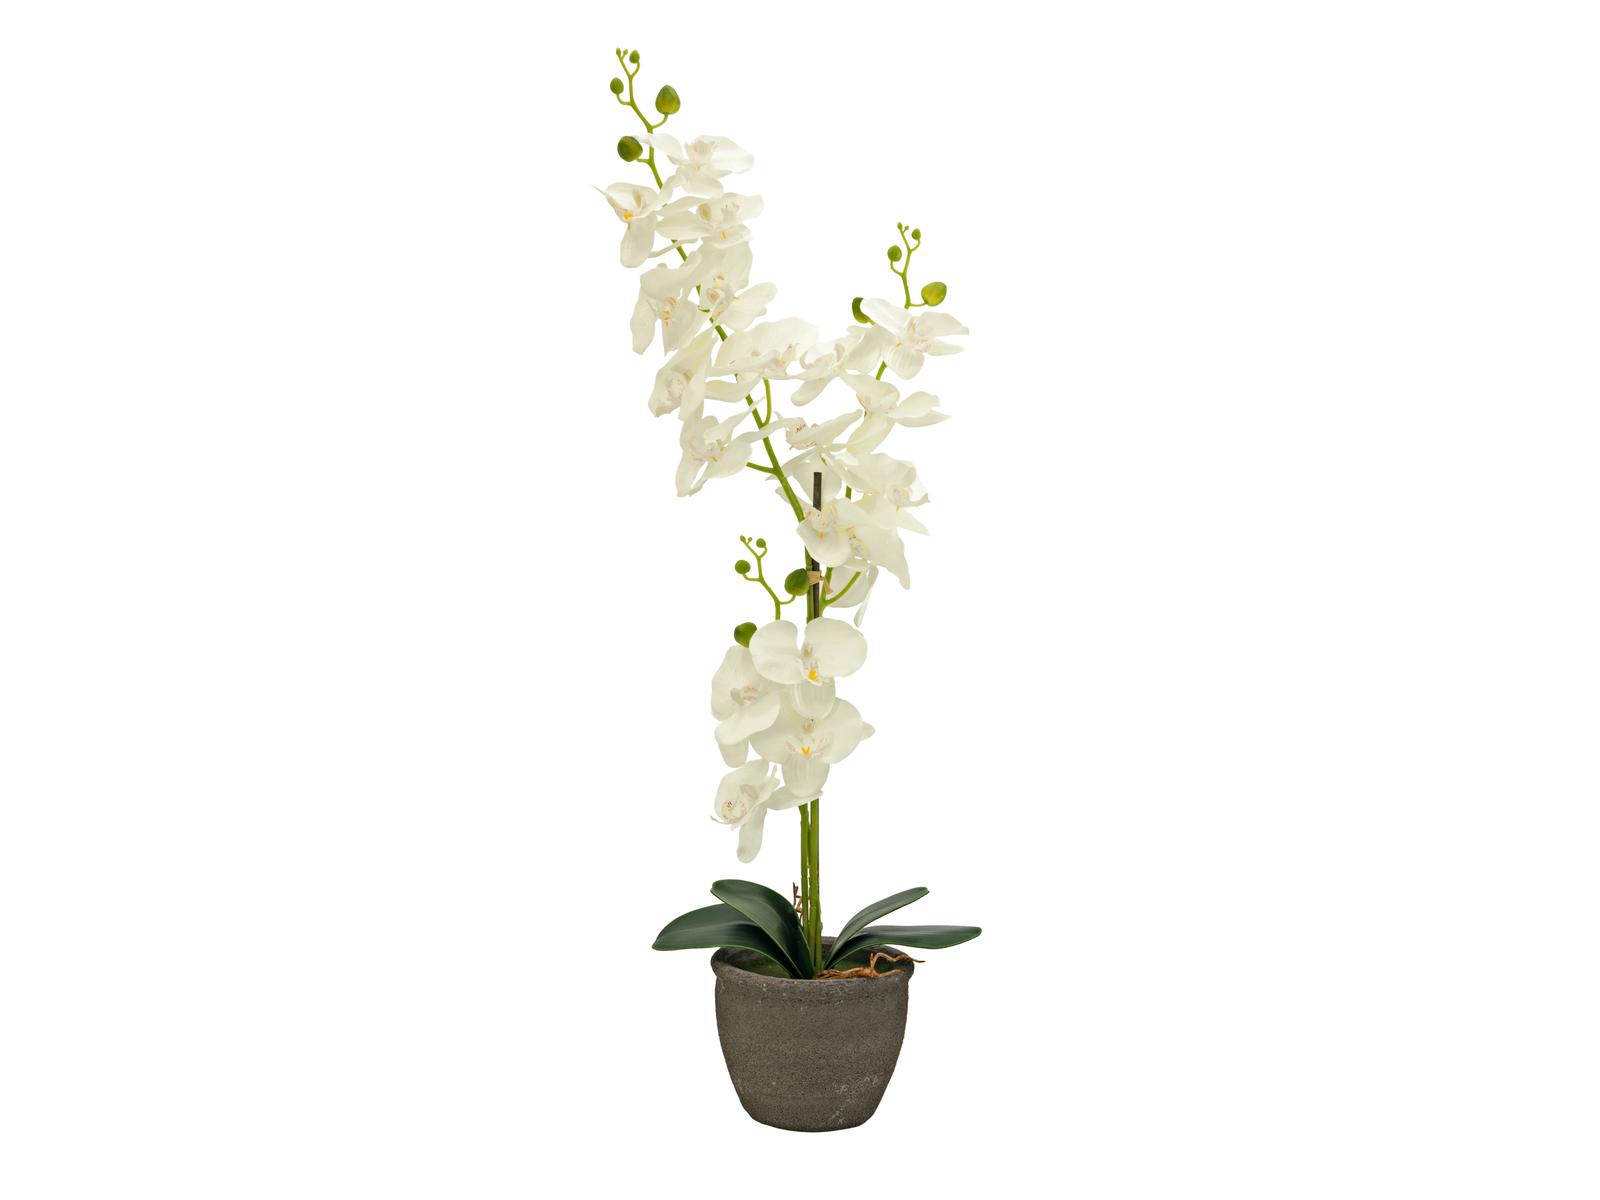 europalms-orchidee-kunstpflanze-cremefarben-65cm